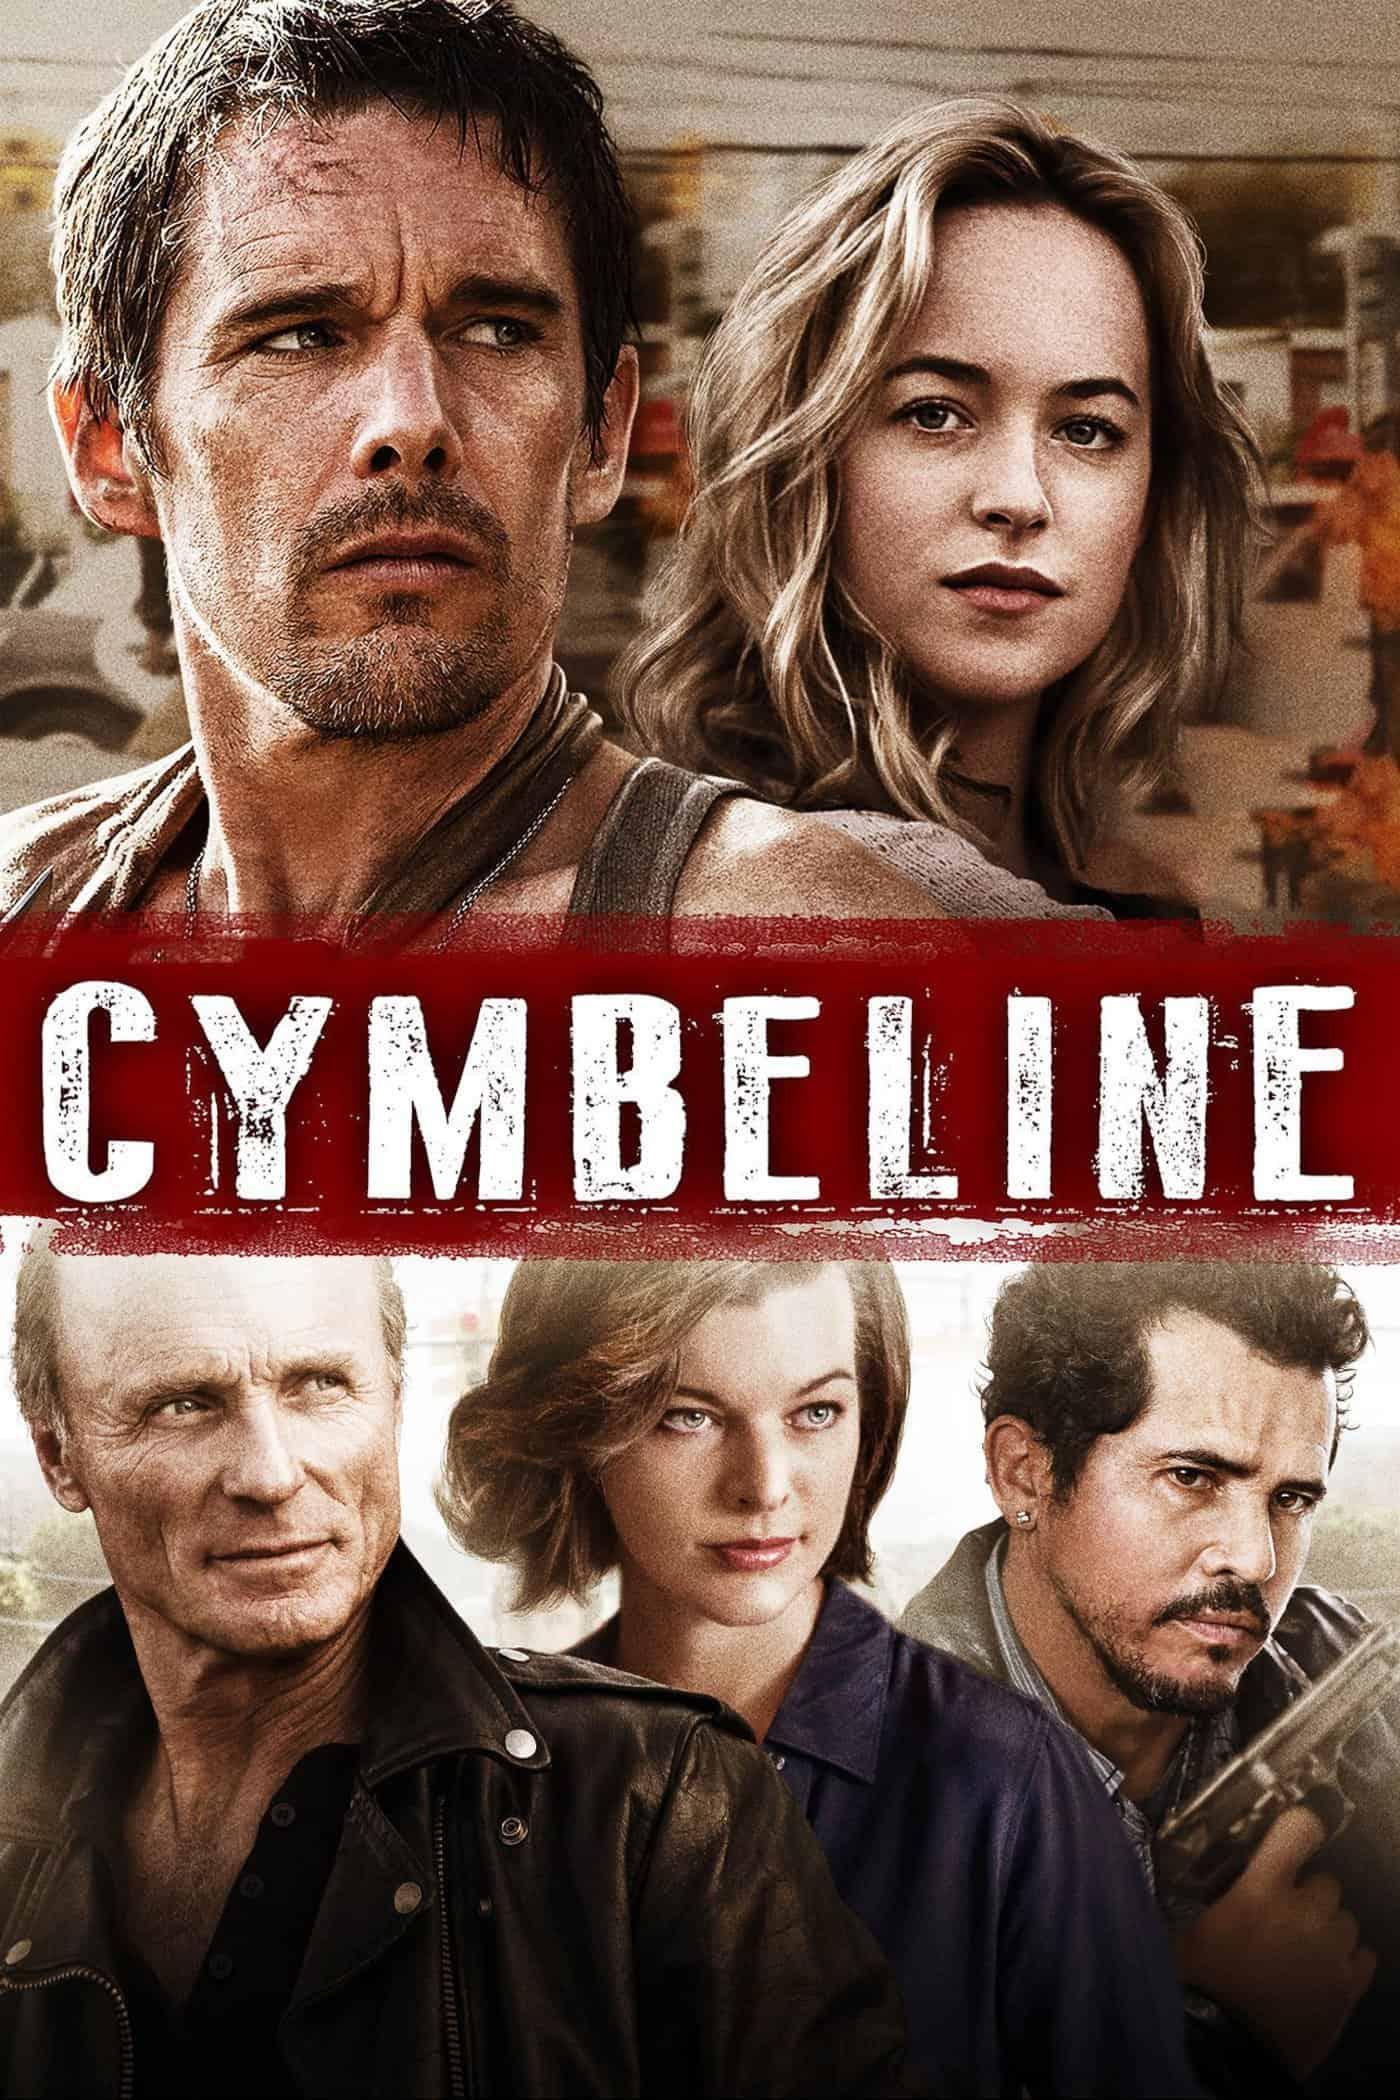 Cymbeline, 2014